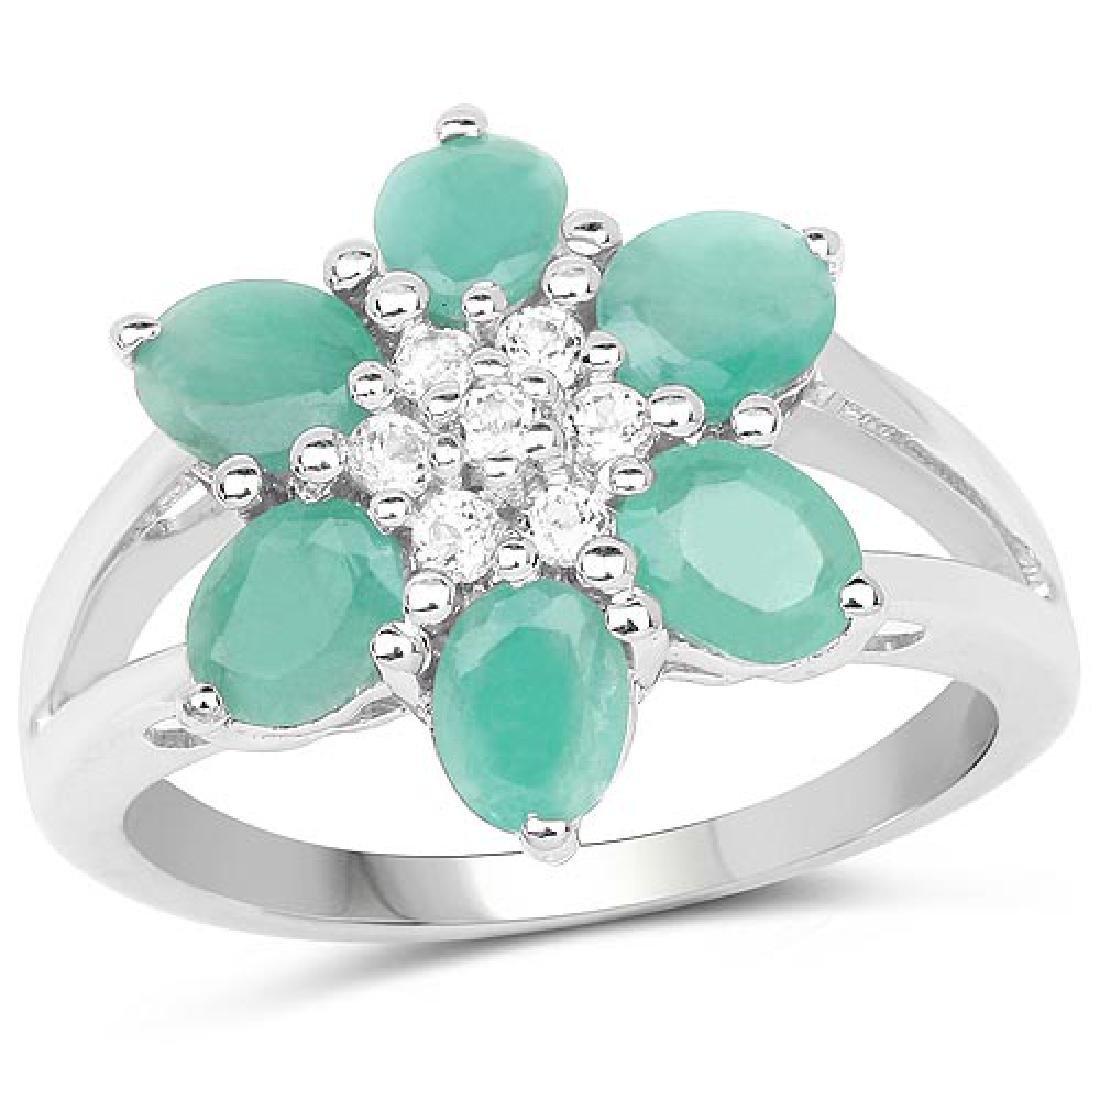 1.93 Carat Genuine Emerald and White Topaz .925 Sterlin